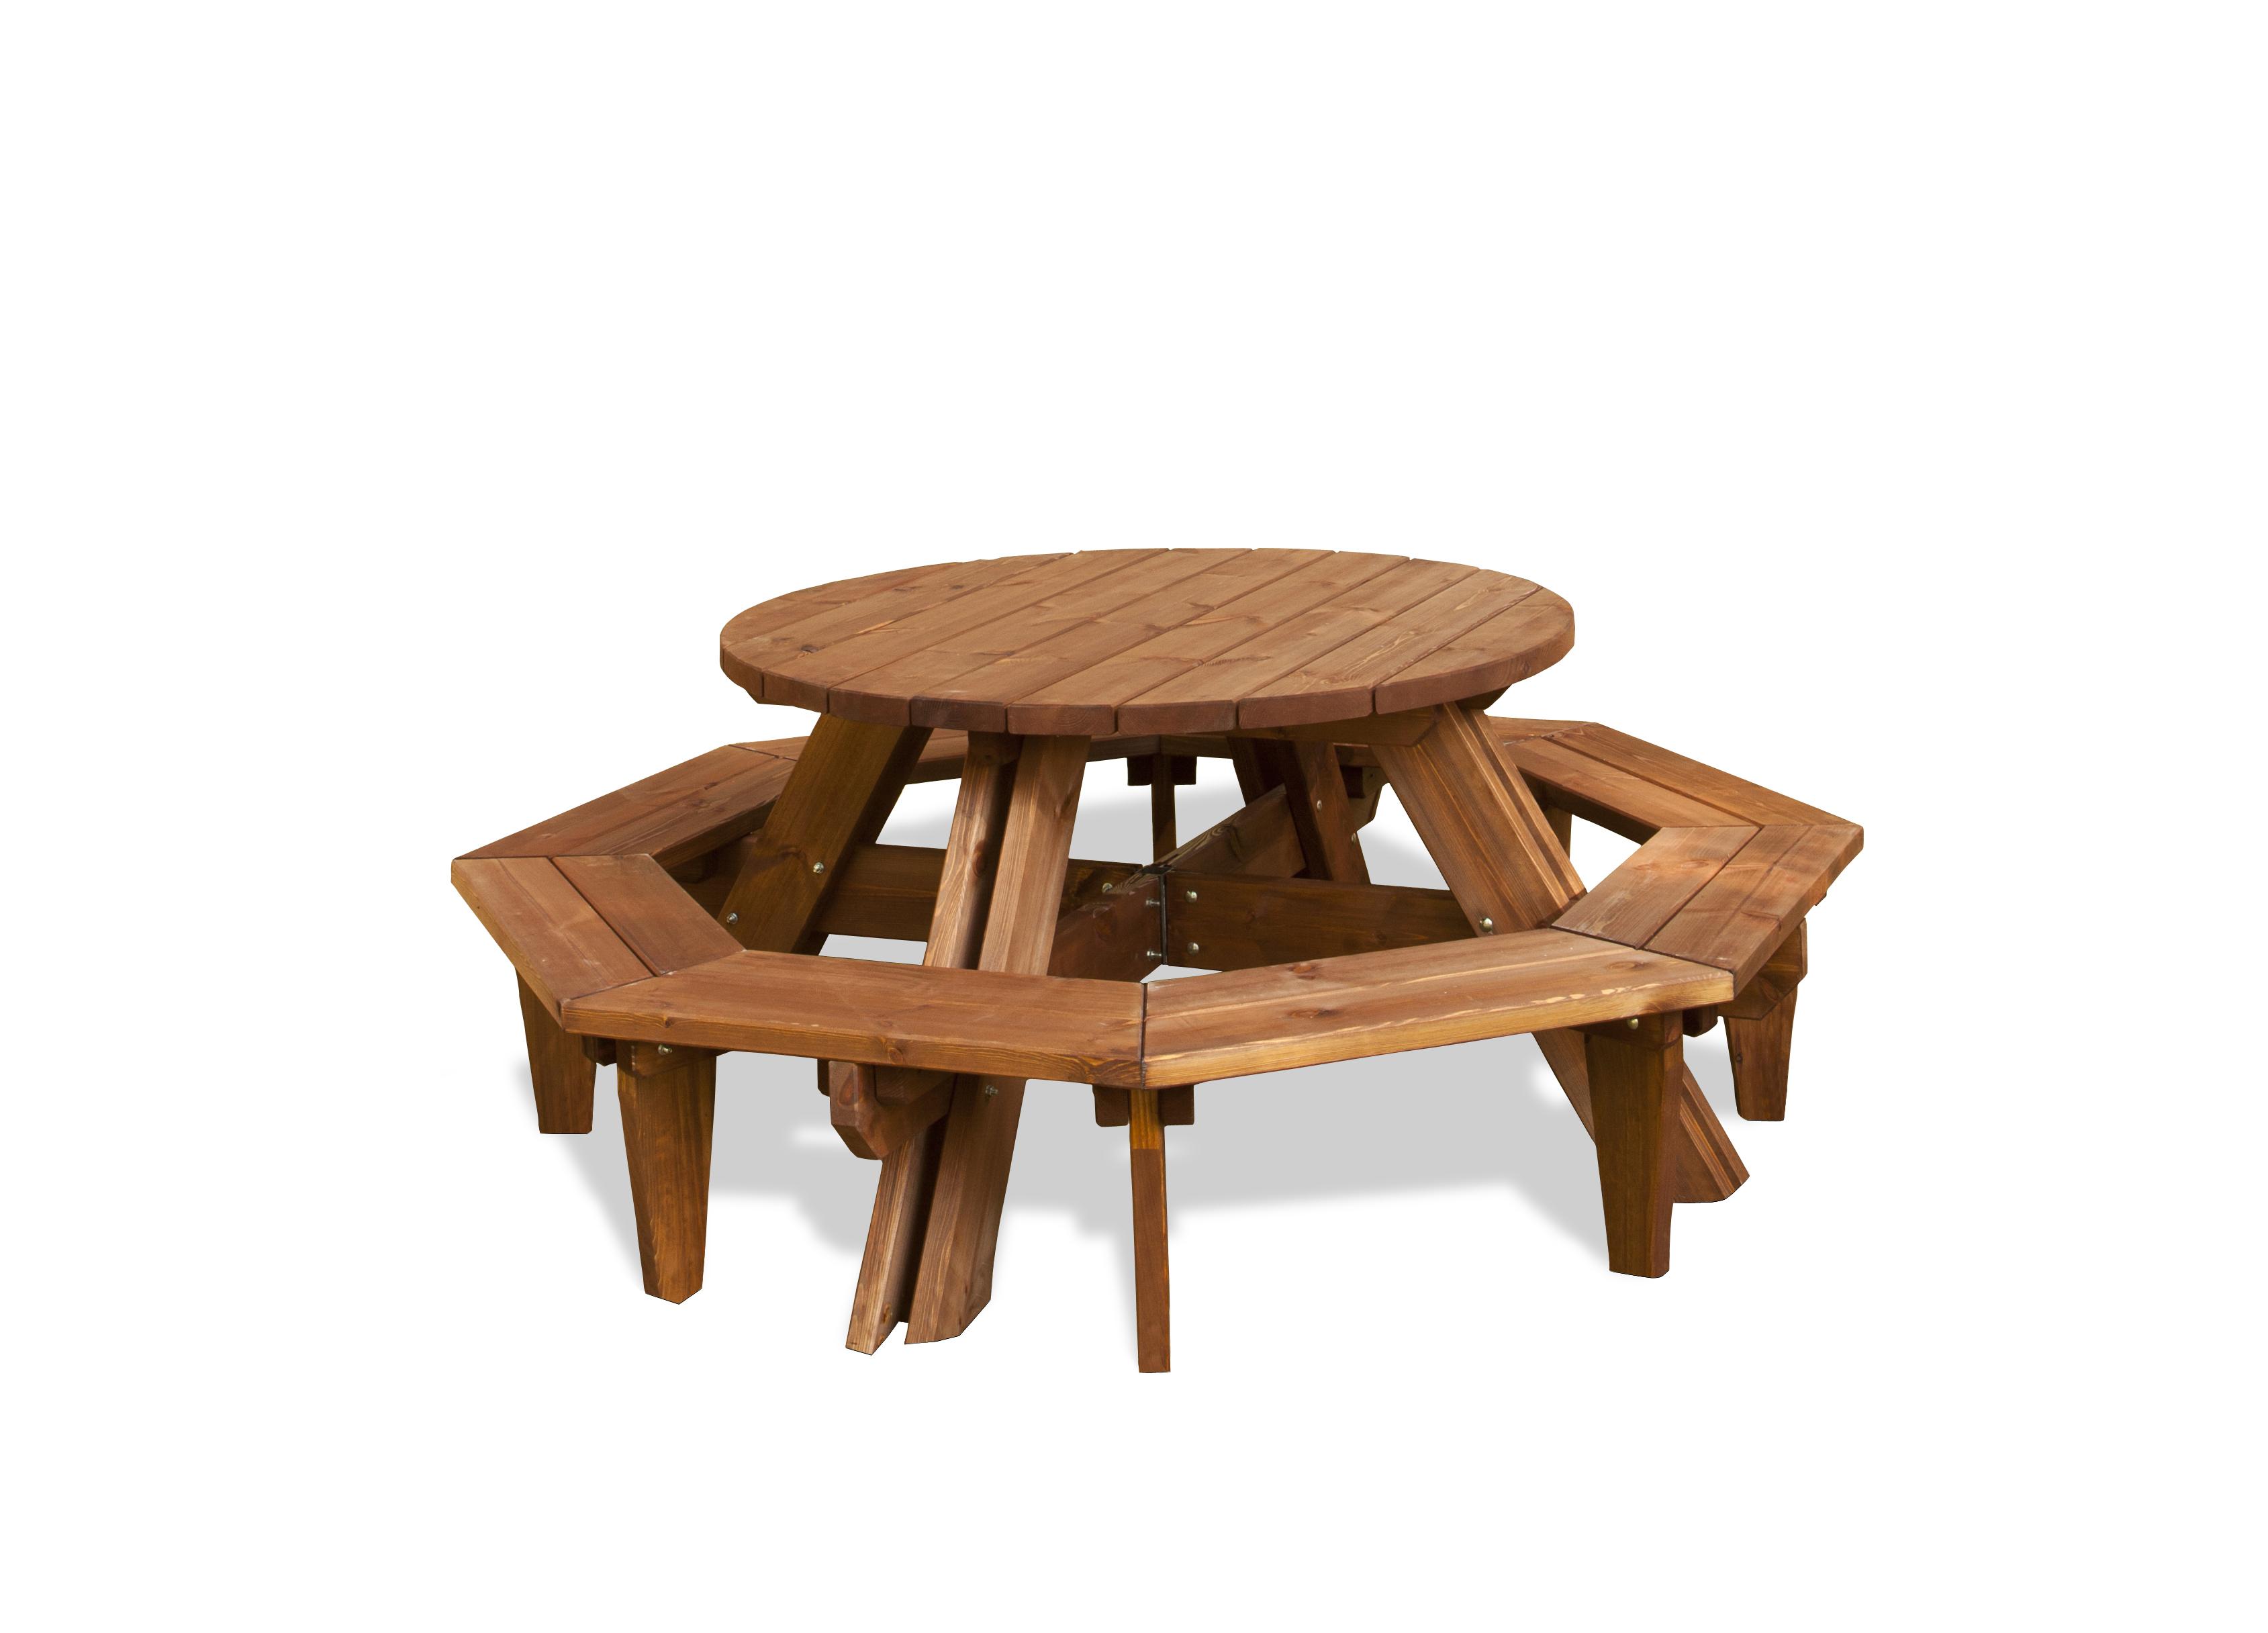 Mesas madera exterior dise os arquitect nicos - Mesas para exterior ...